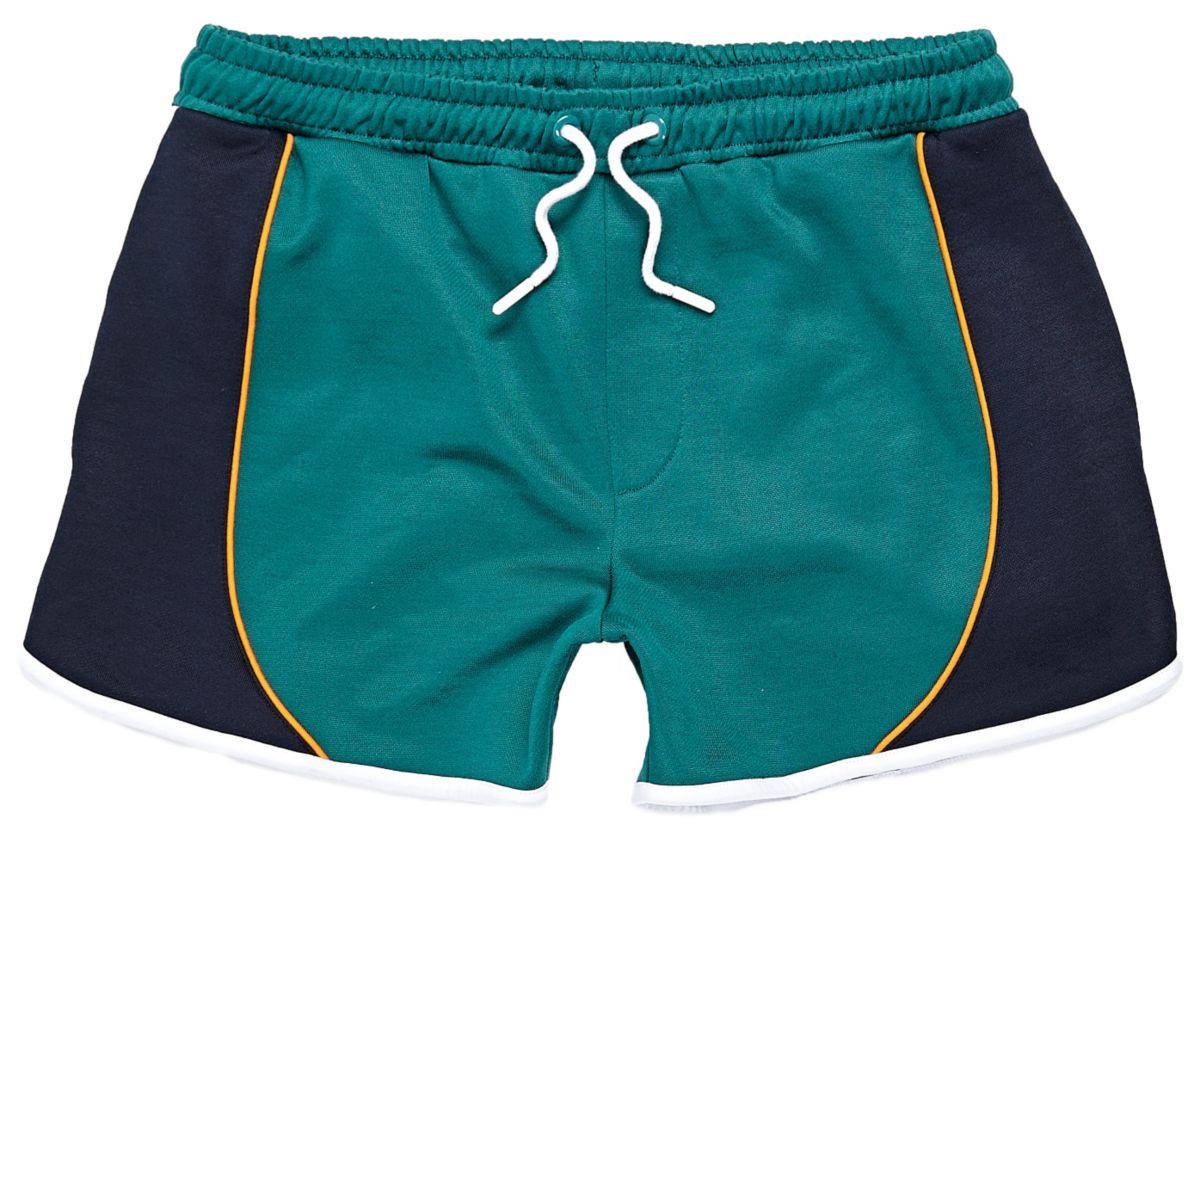 Green sporty runner shorts